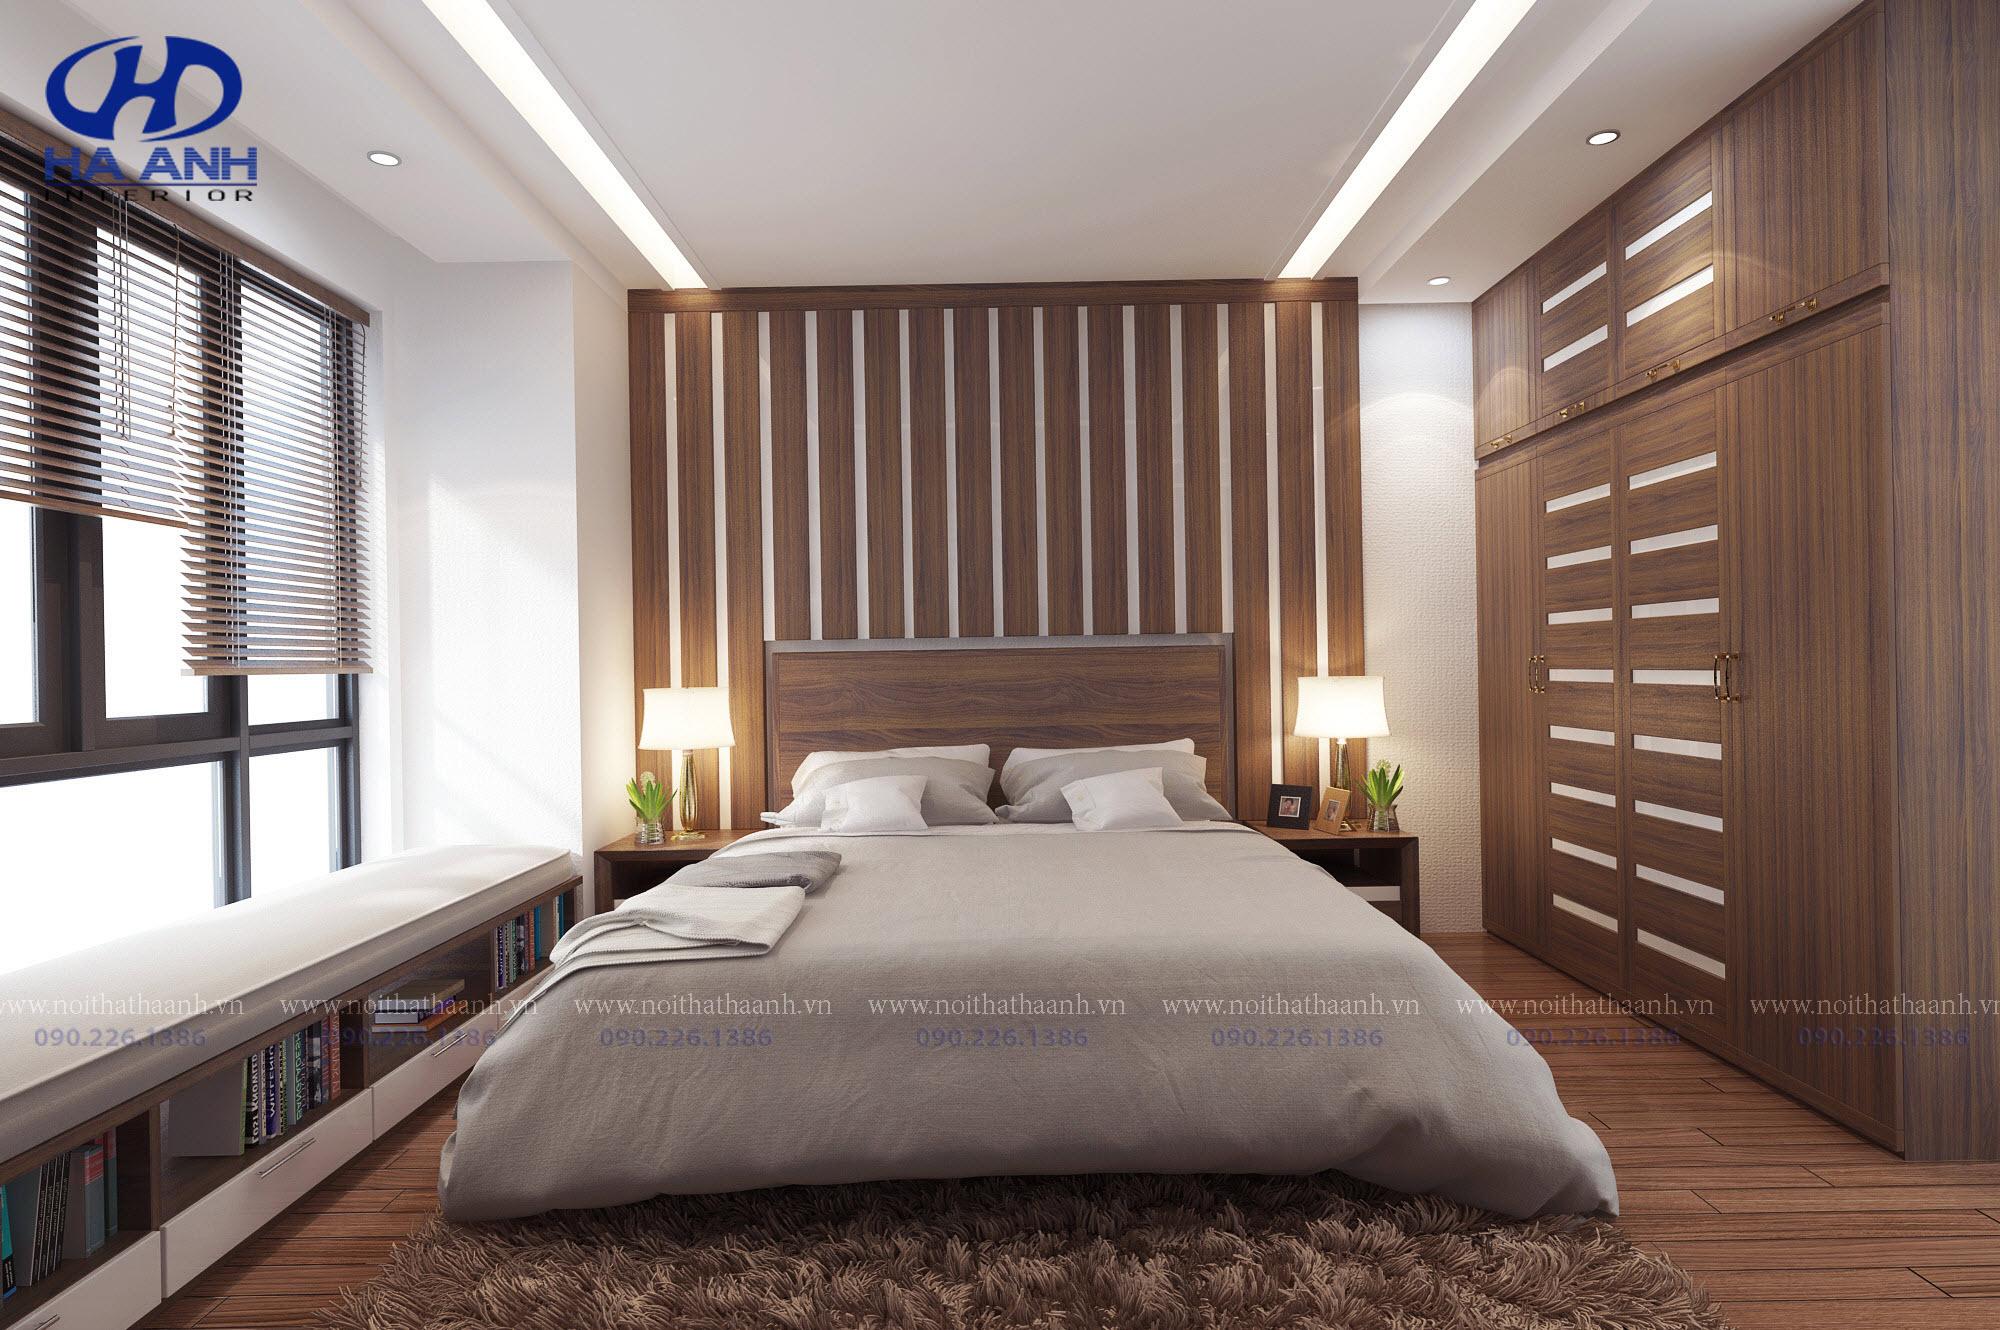 Phòng ngủ laminate HA-8020